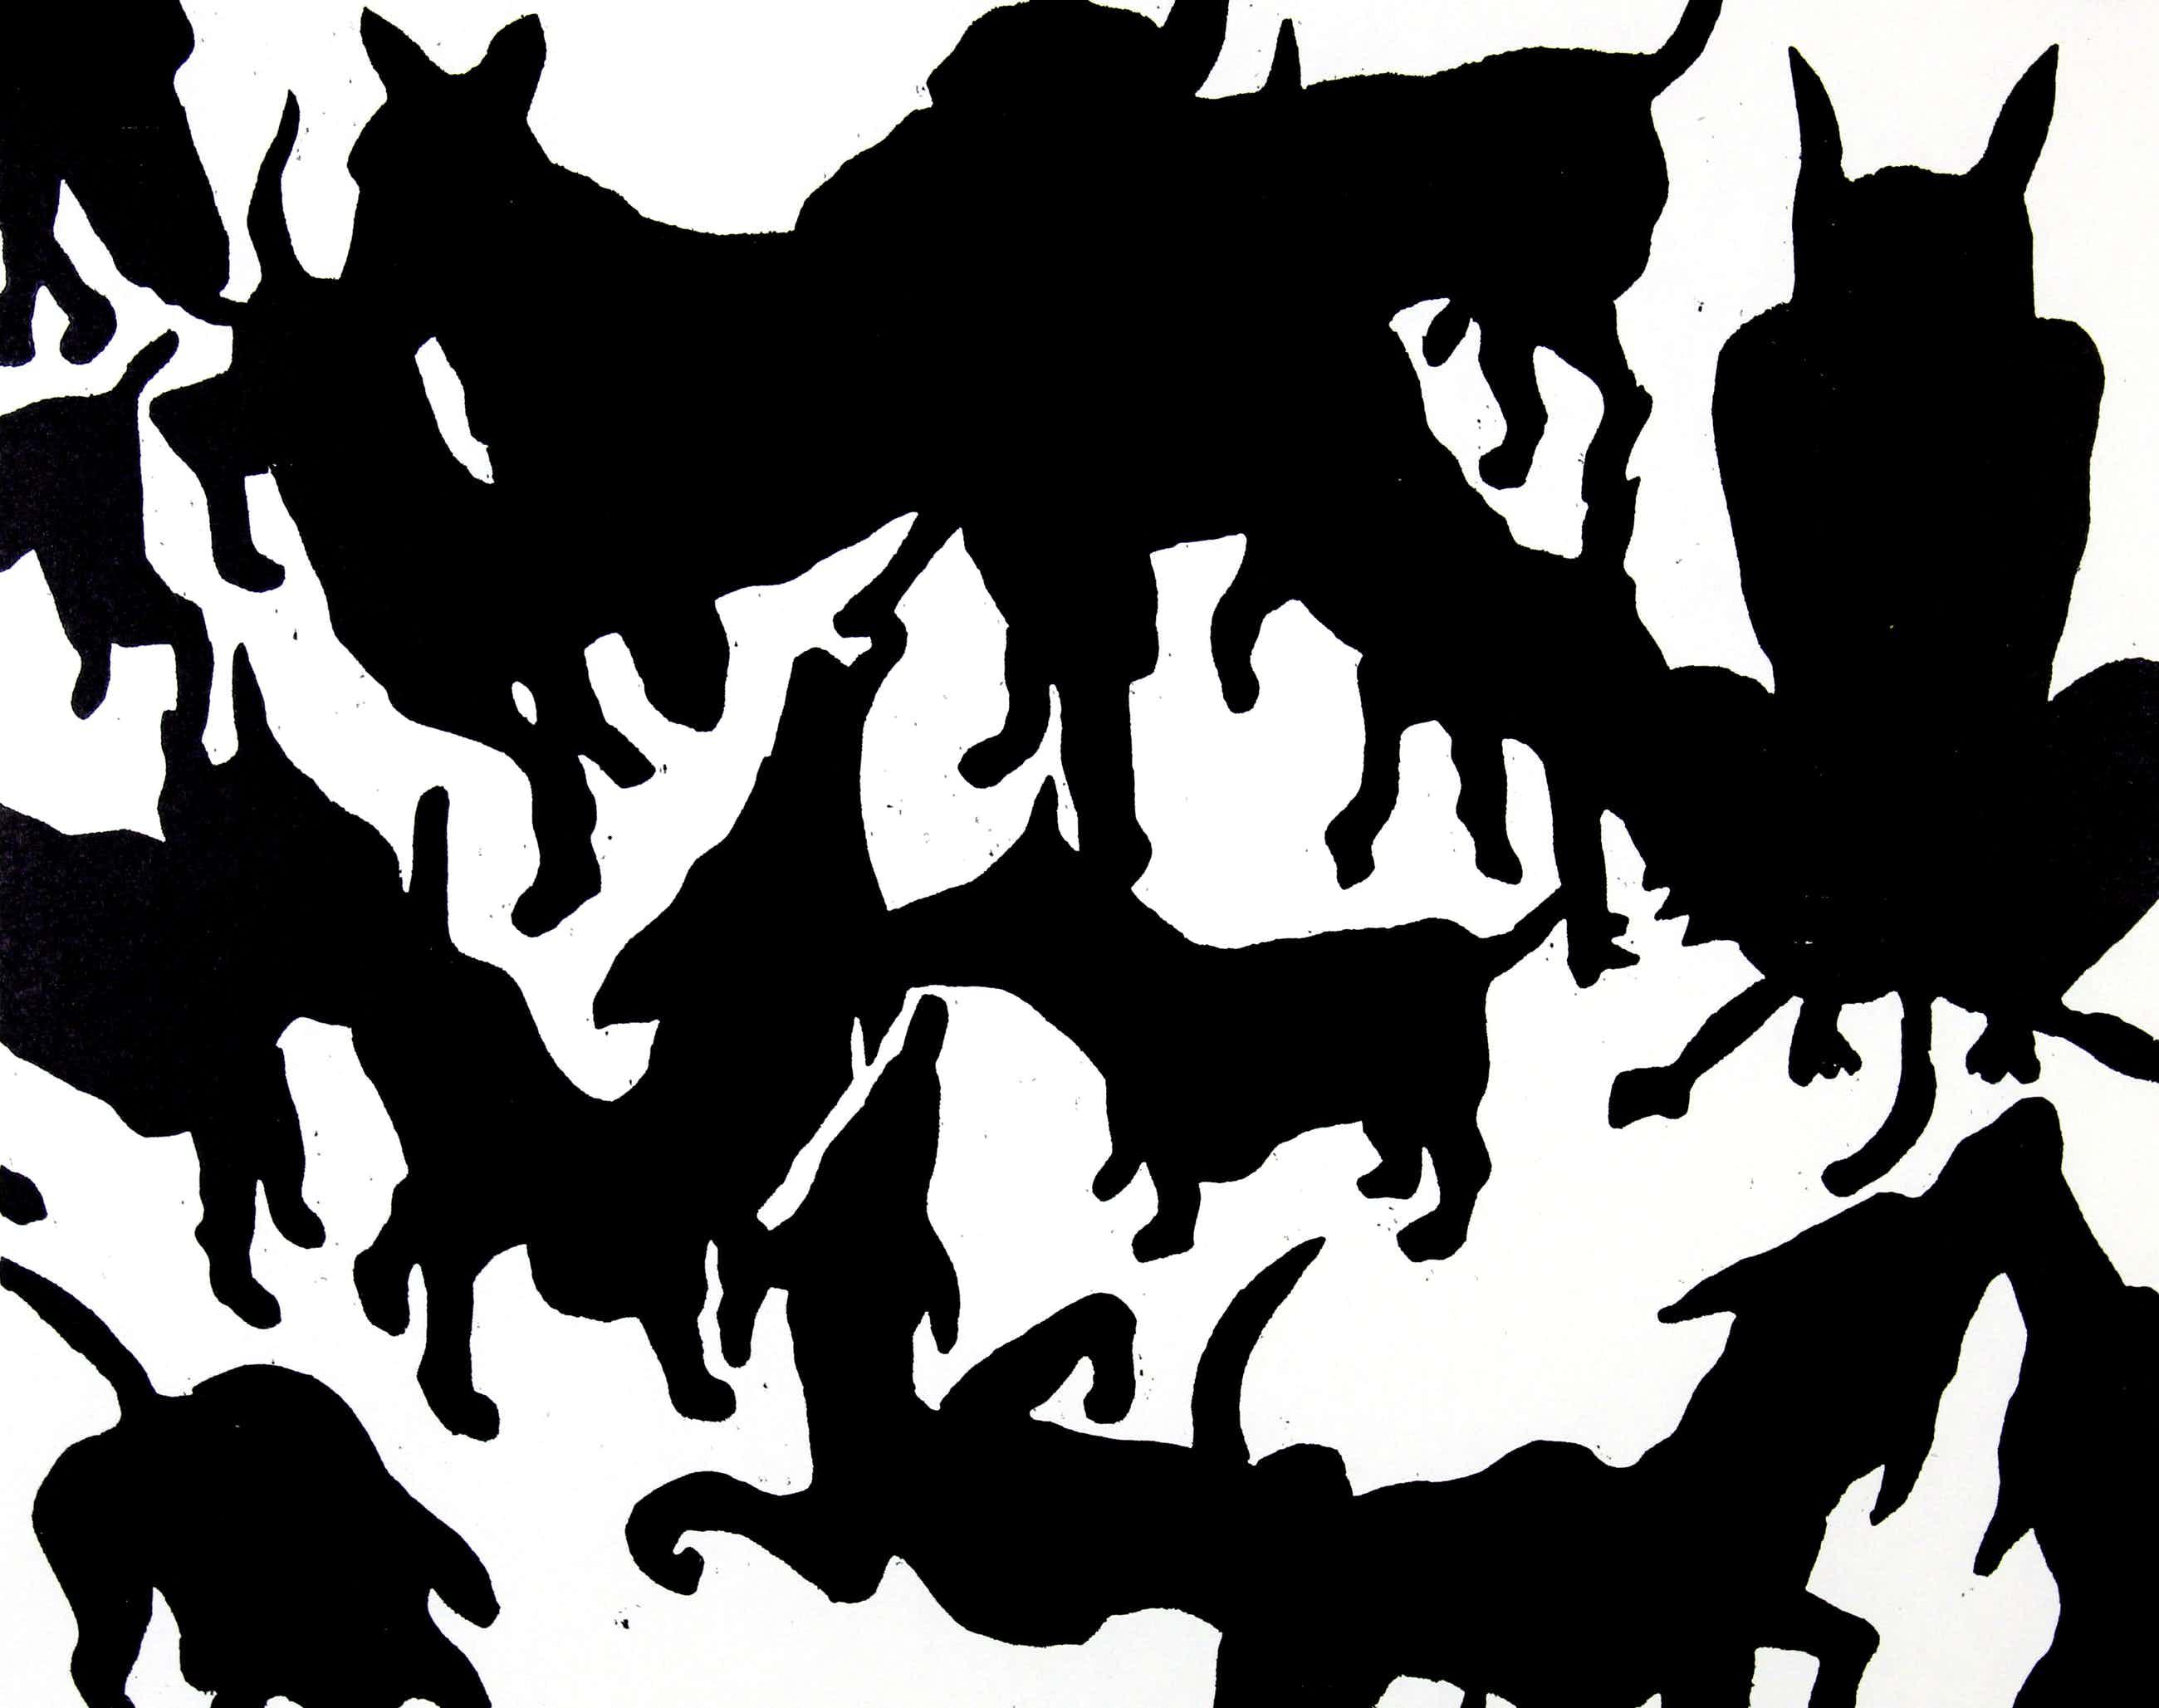 Ad van Riel - Doggy World (1) 9/10 kopen? Bied vanaf 35!